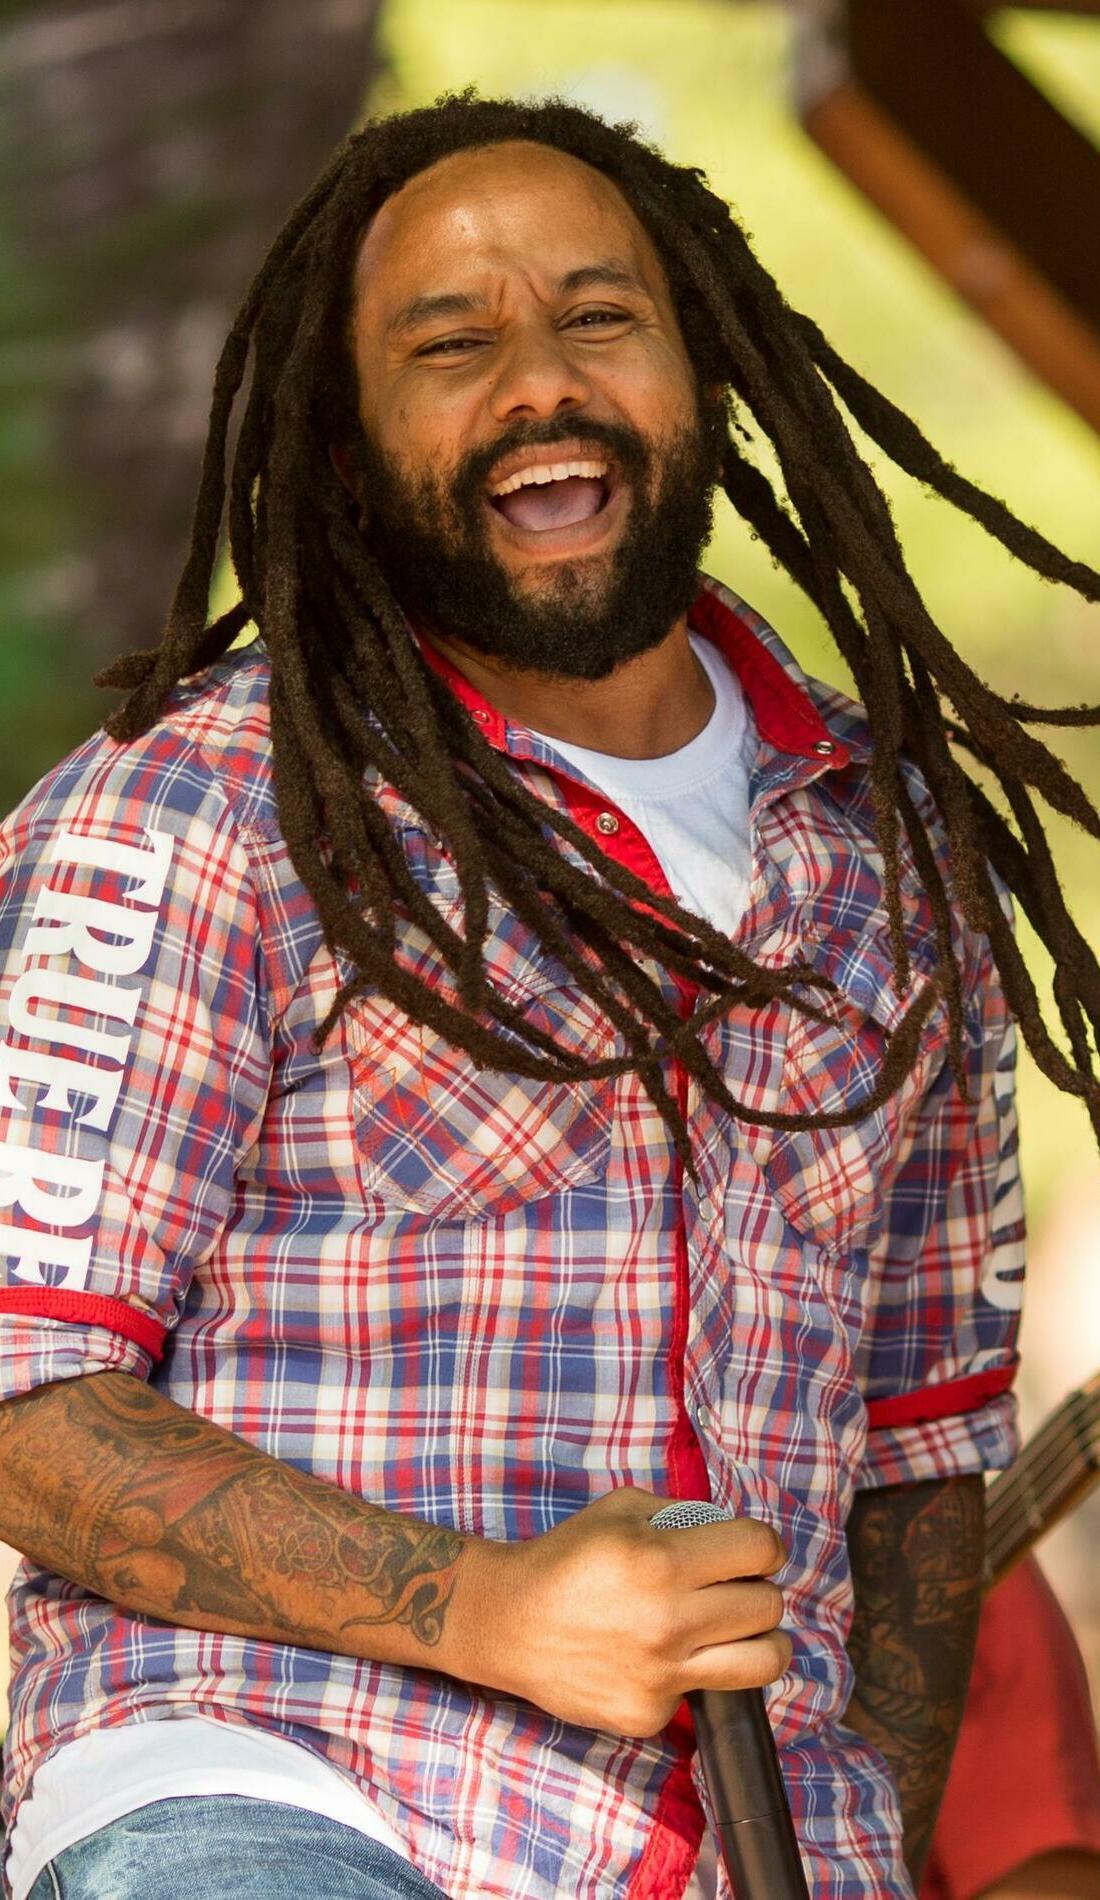 A Ky-Mani Marley live event